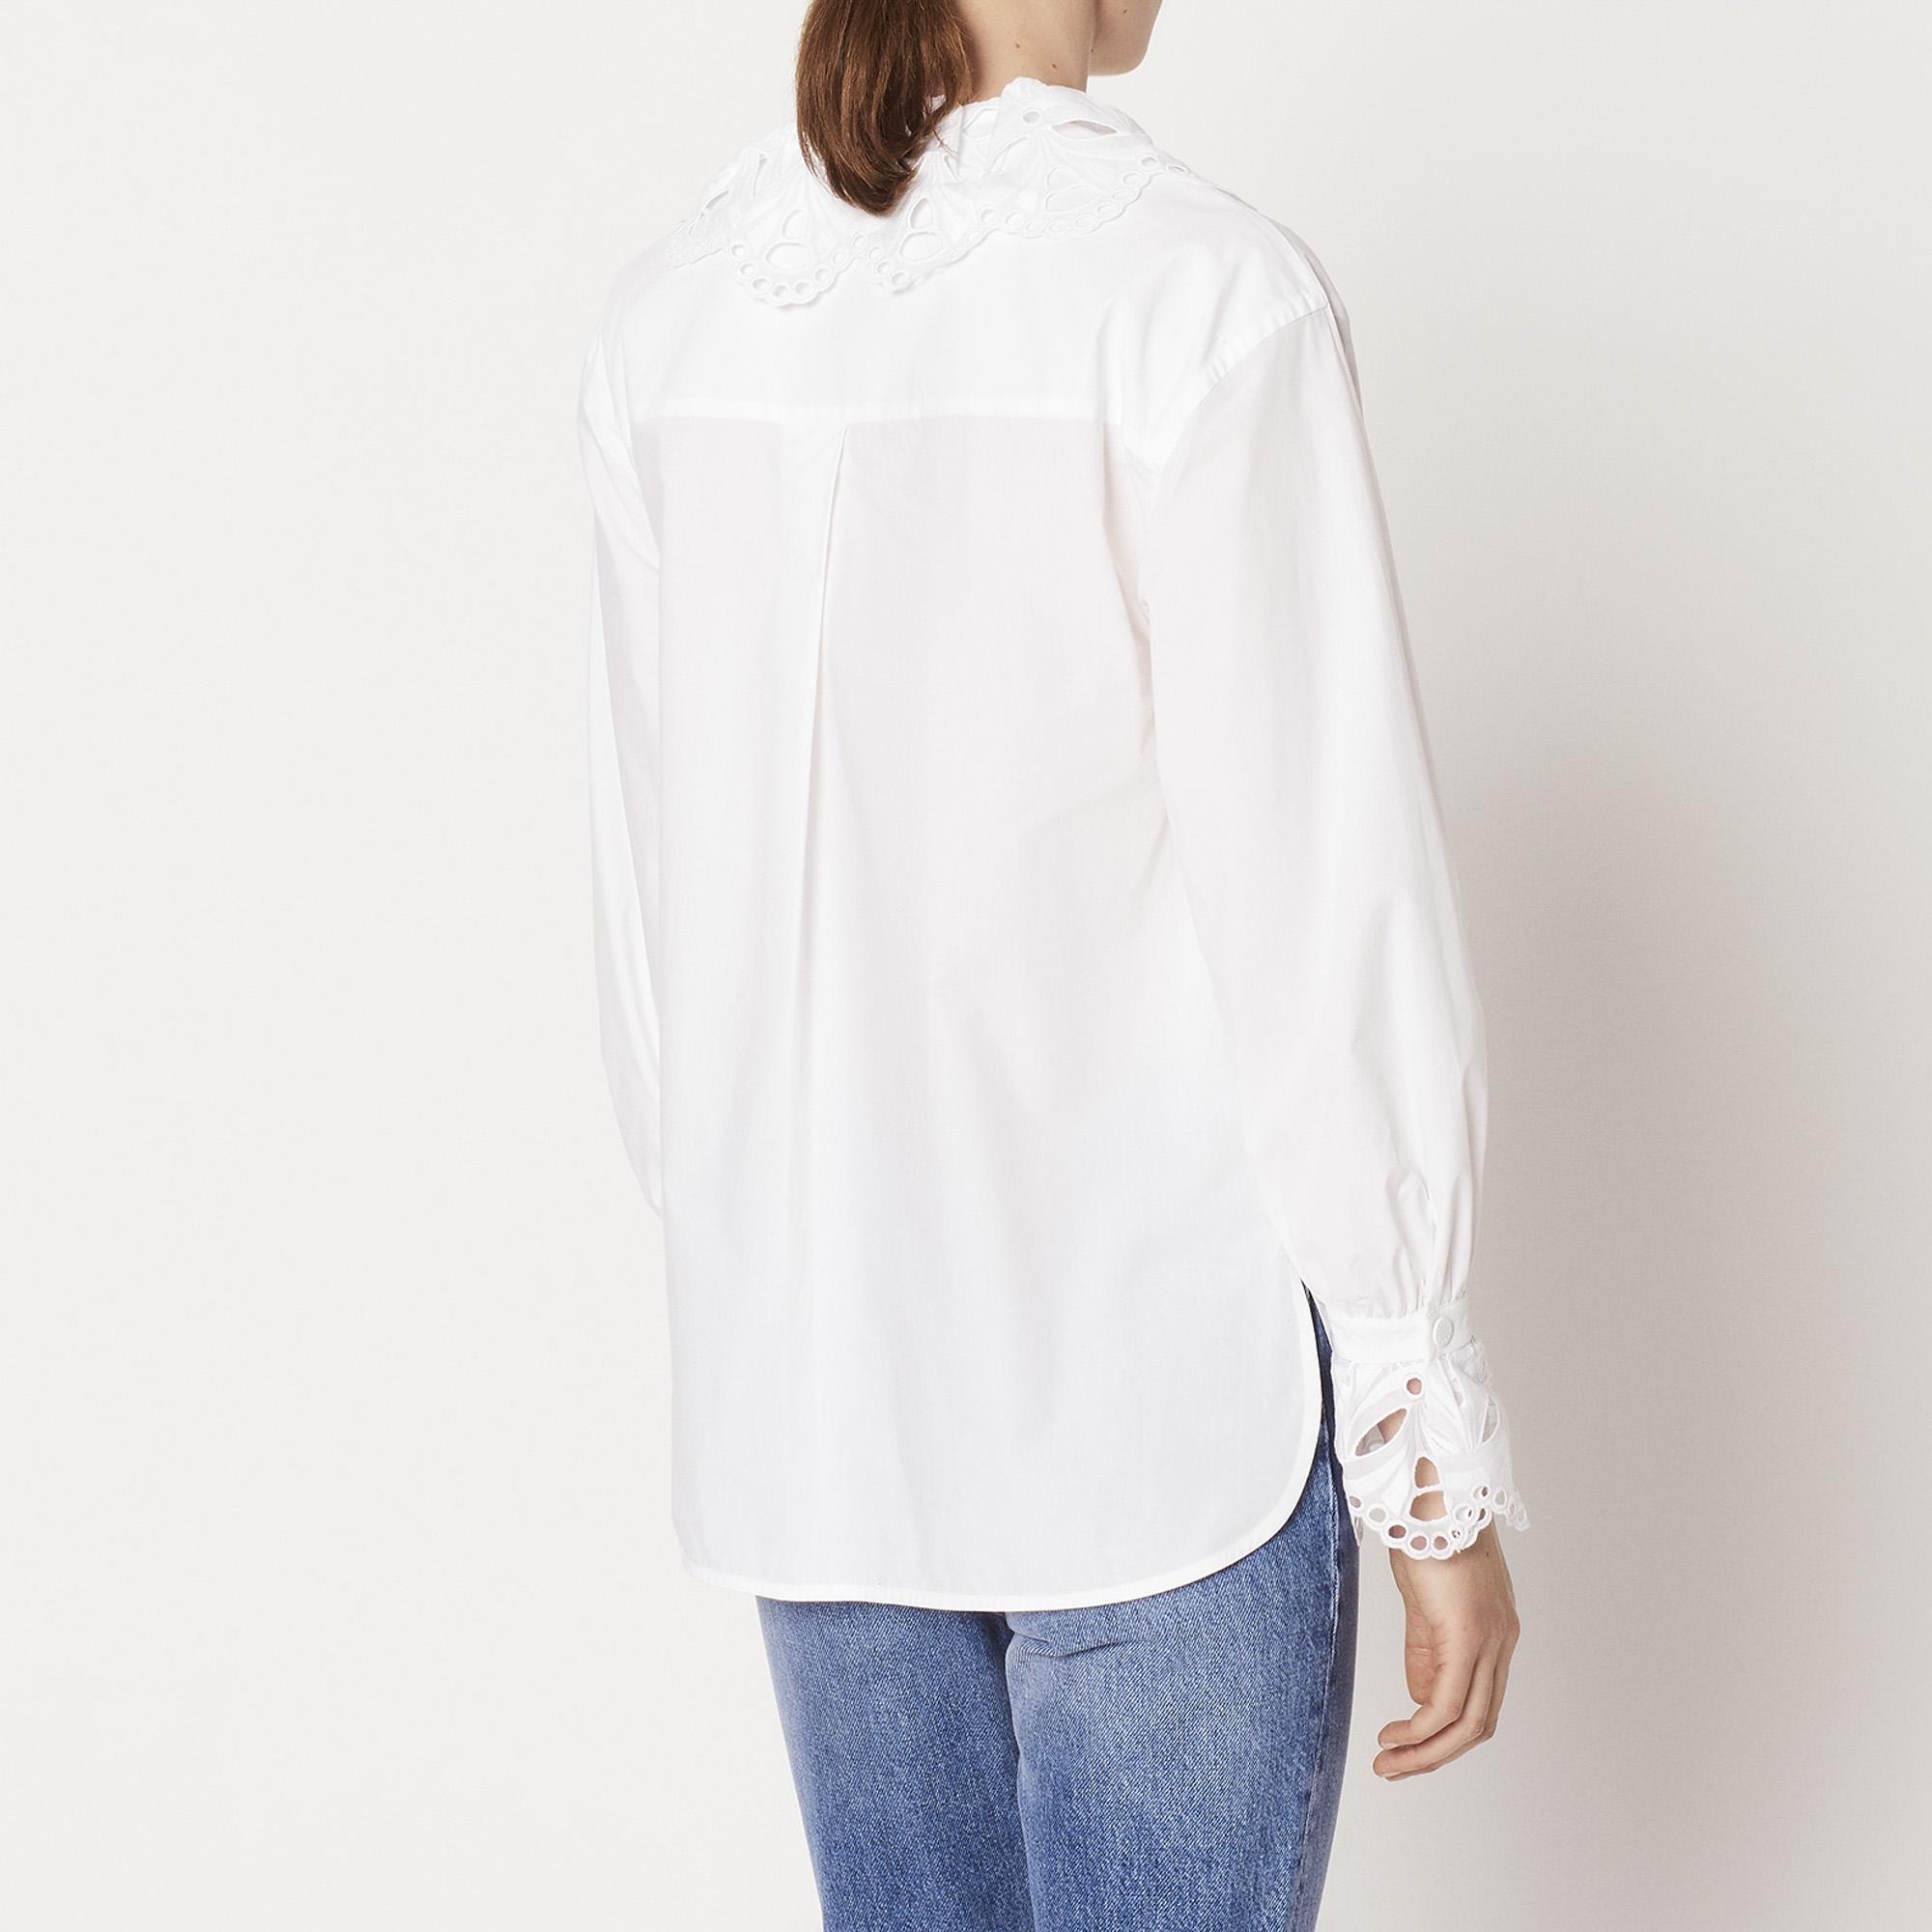 chemise col en broderie anglaise c11471h tops. Black Bedroom Furniture Sets. Home Design Ideas